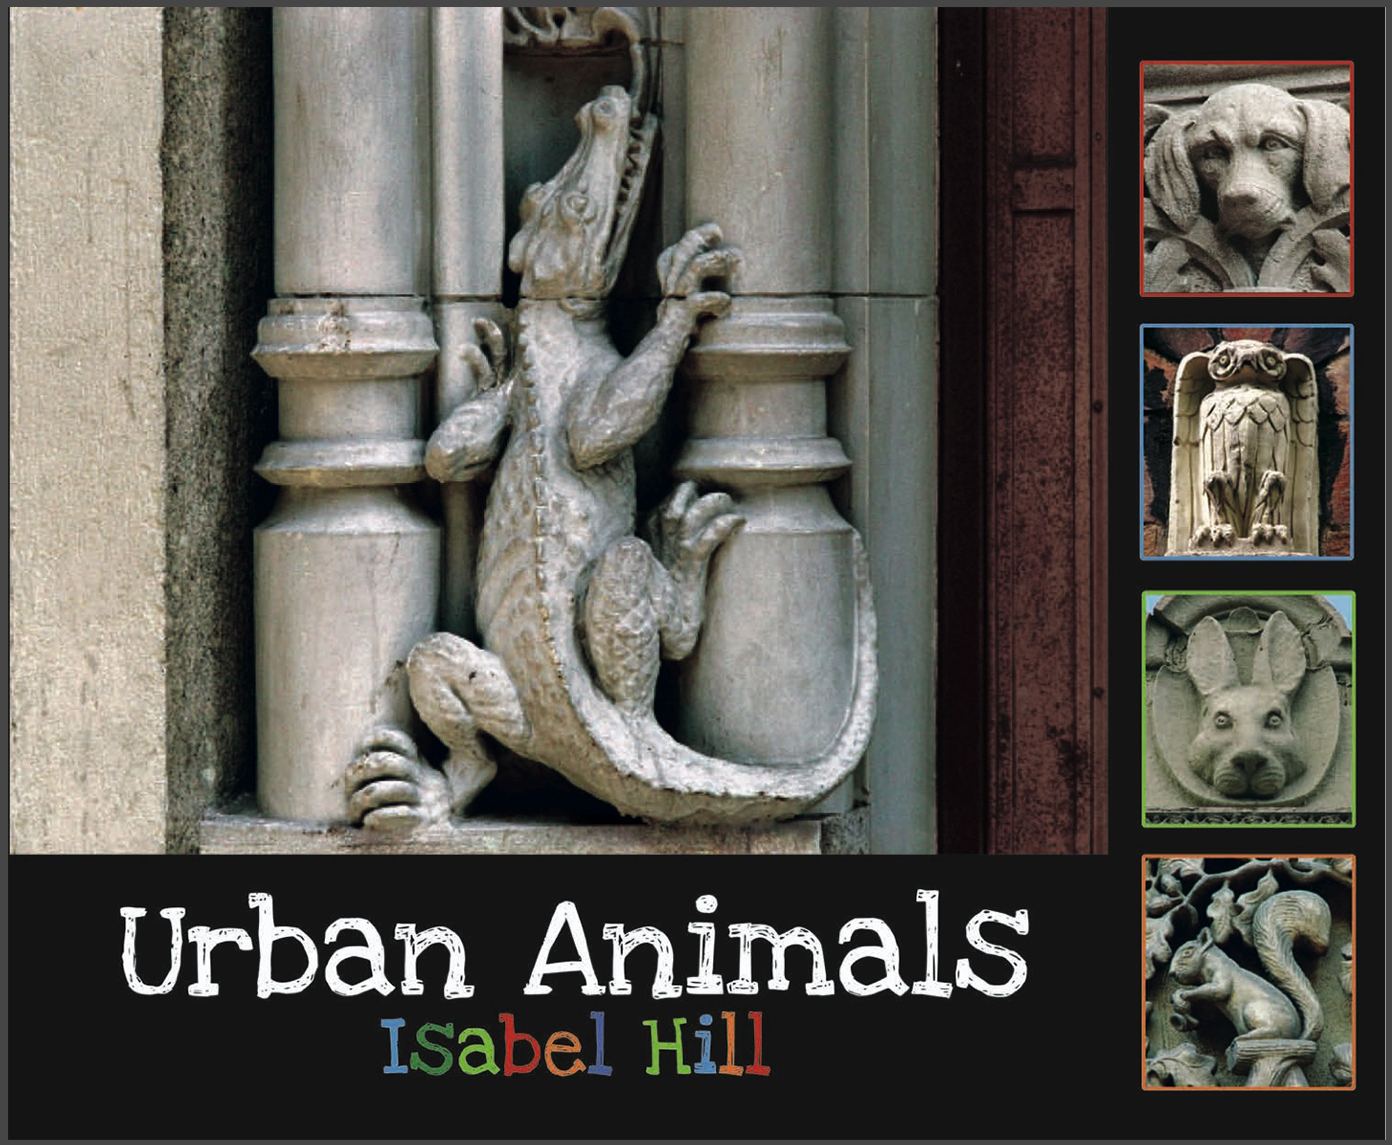 UrbanAnimals frontcover w frame.jpg